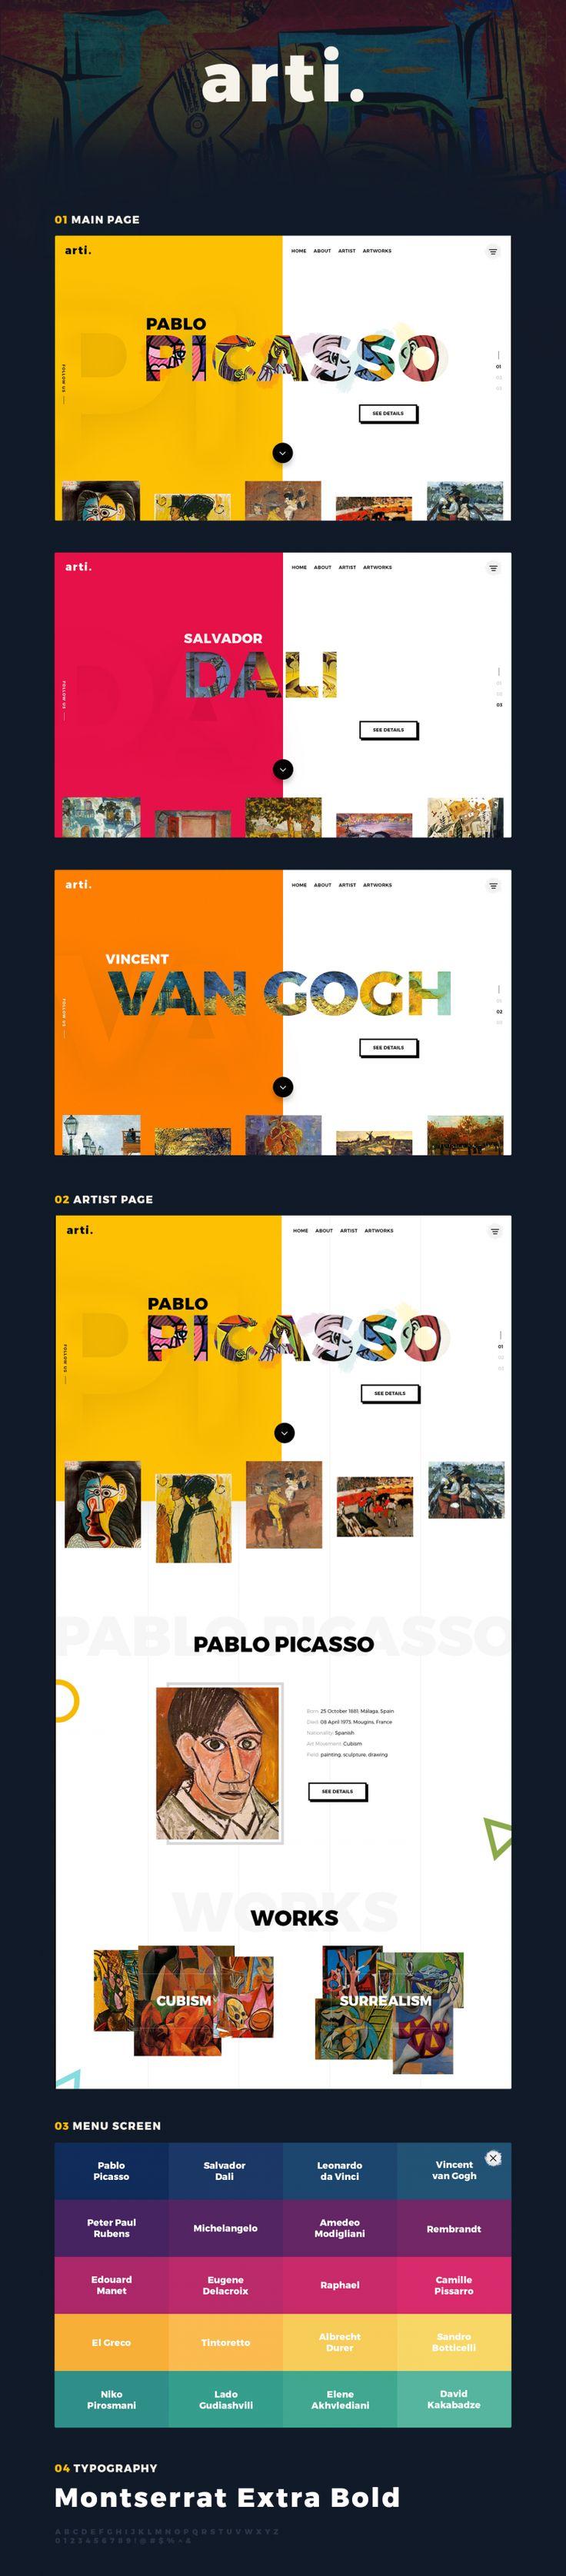 Arti Web Design Inspiration